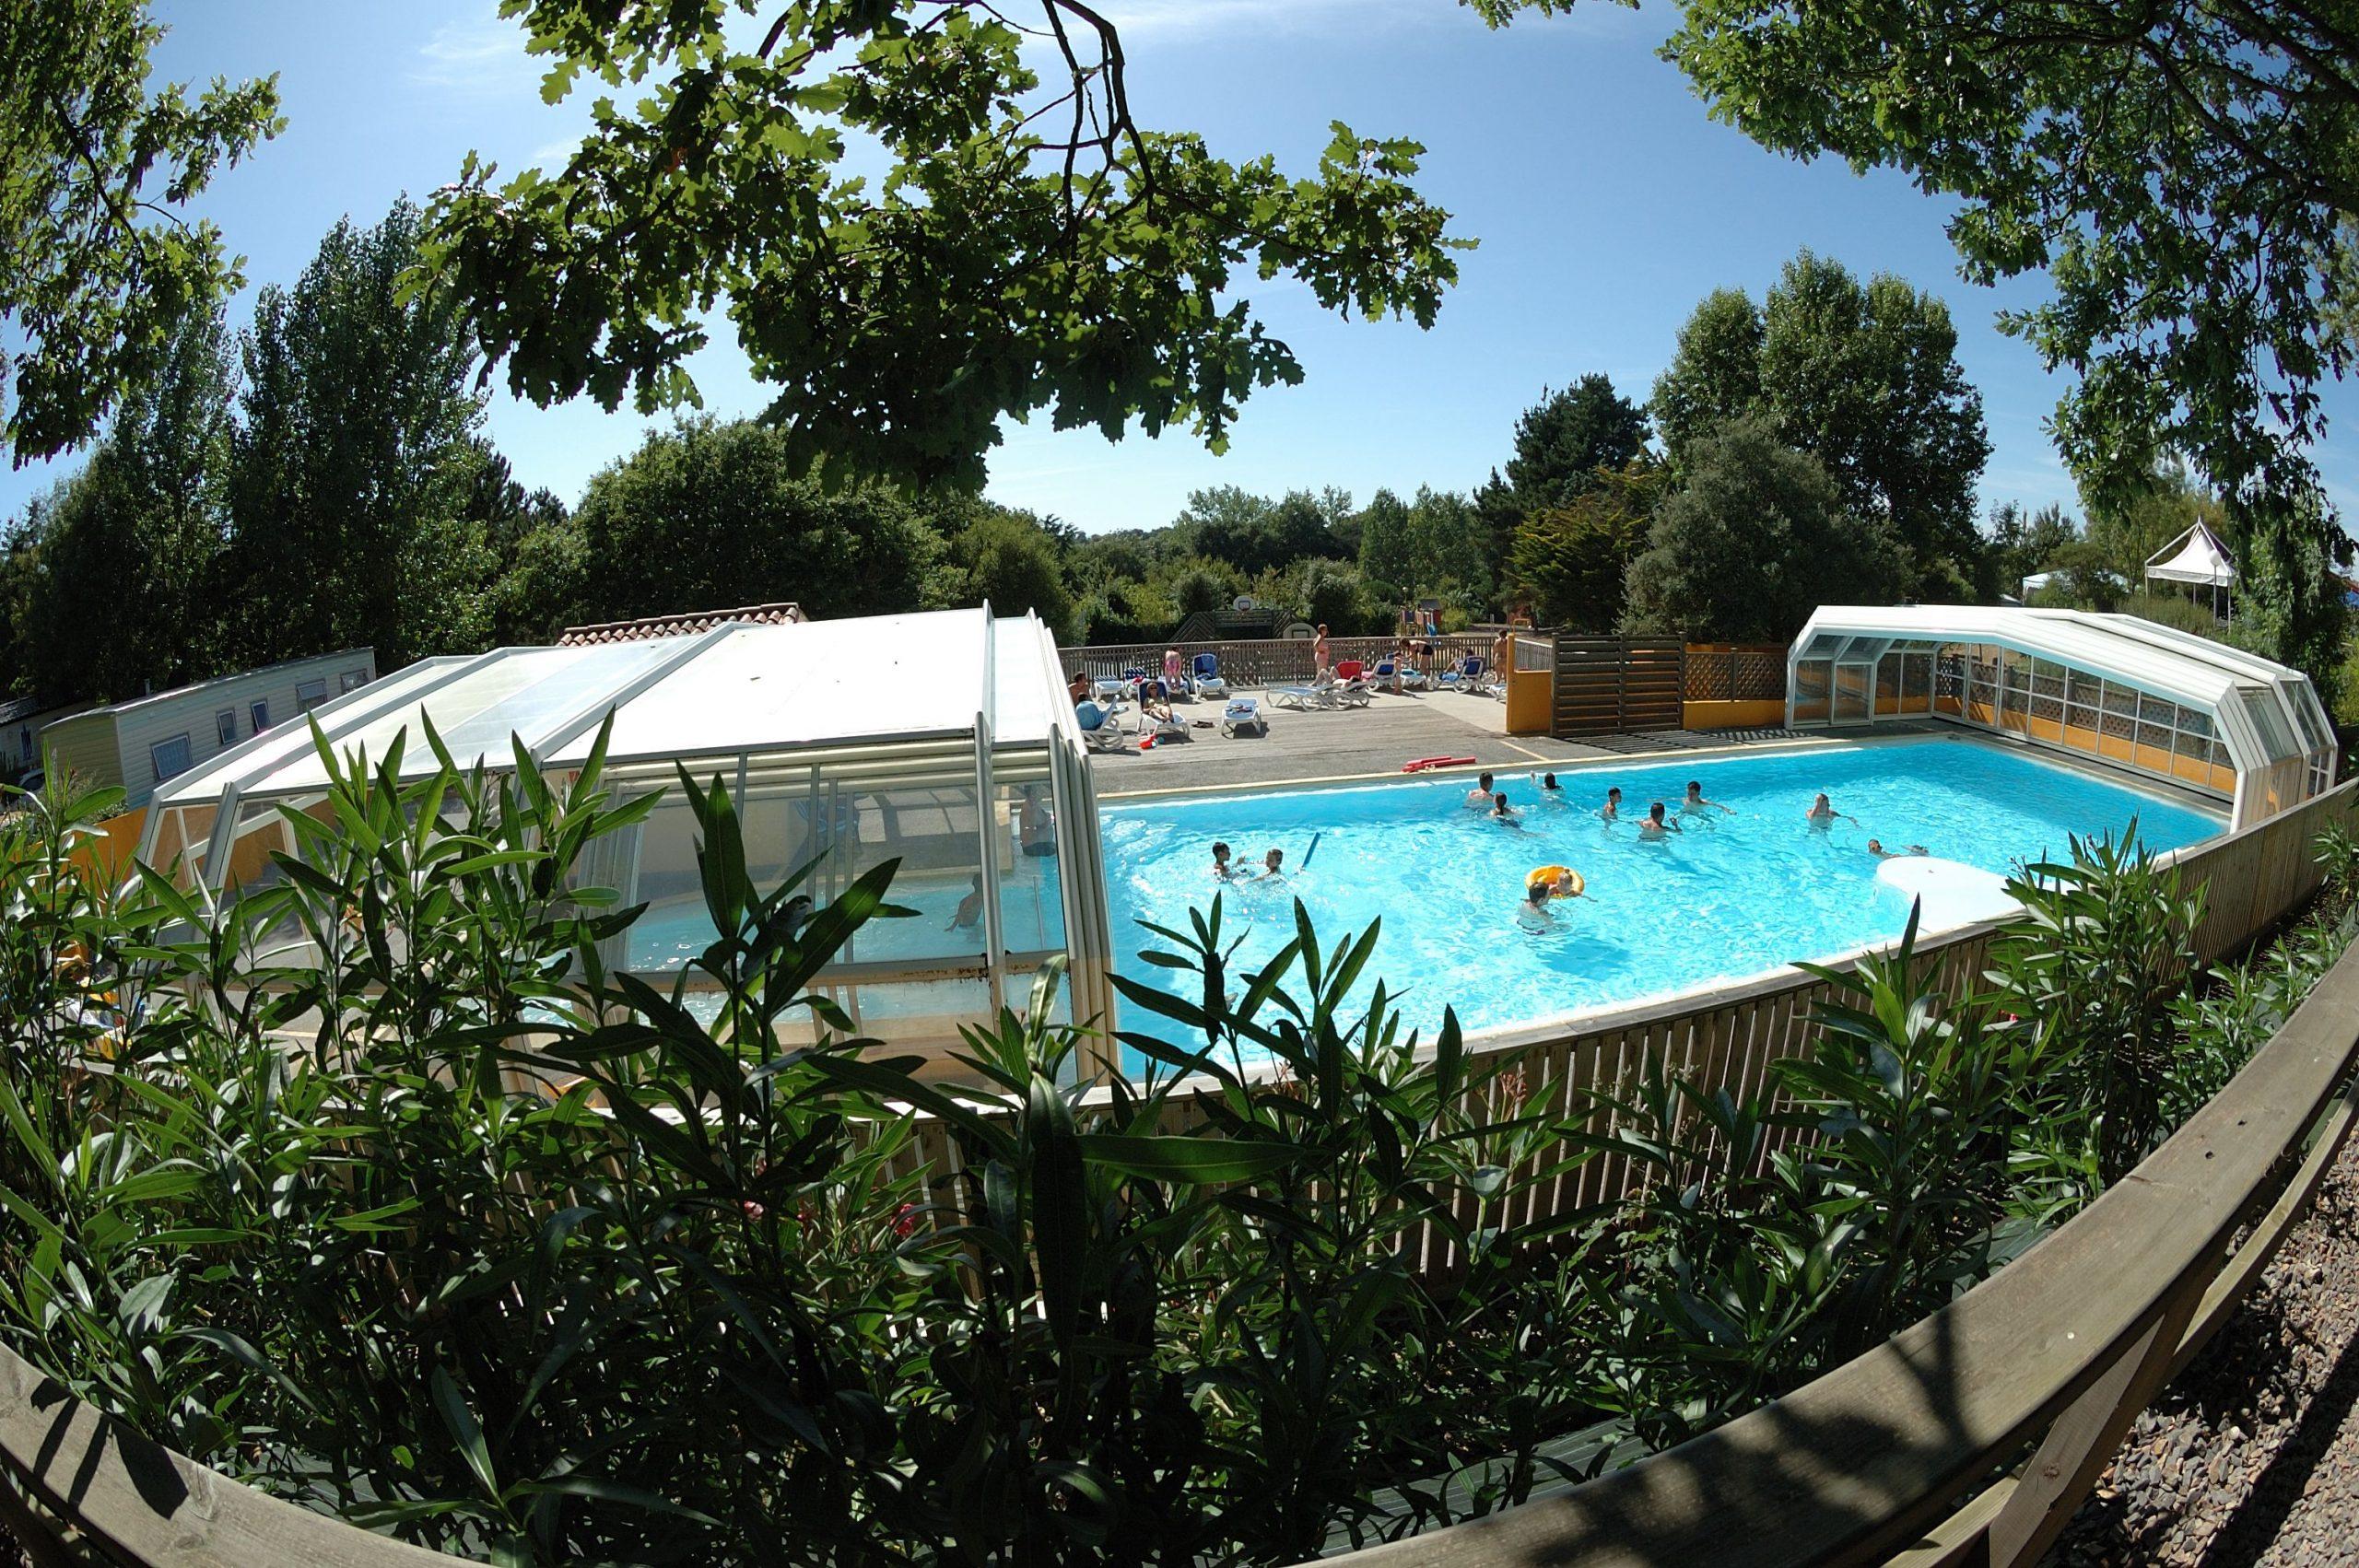 Camping*** Le Paradis - Talmont Saint Hilaire #camping ... serapportantà Piscine St Brevin